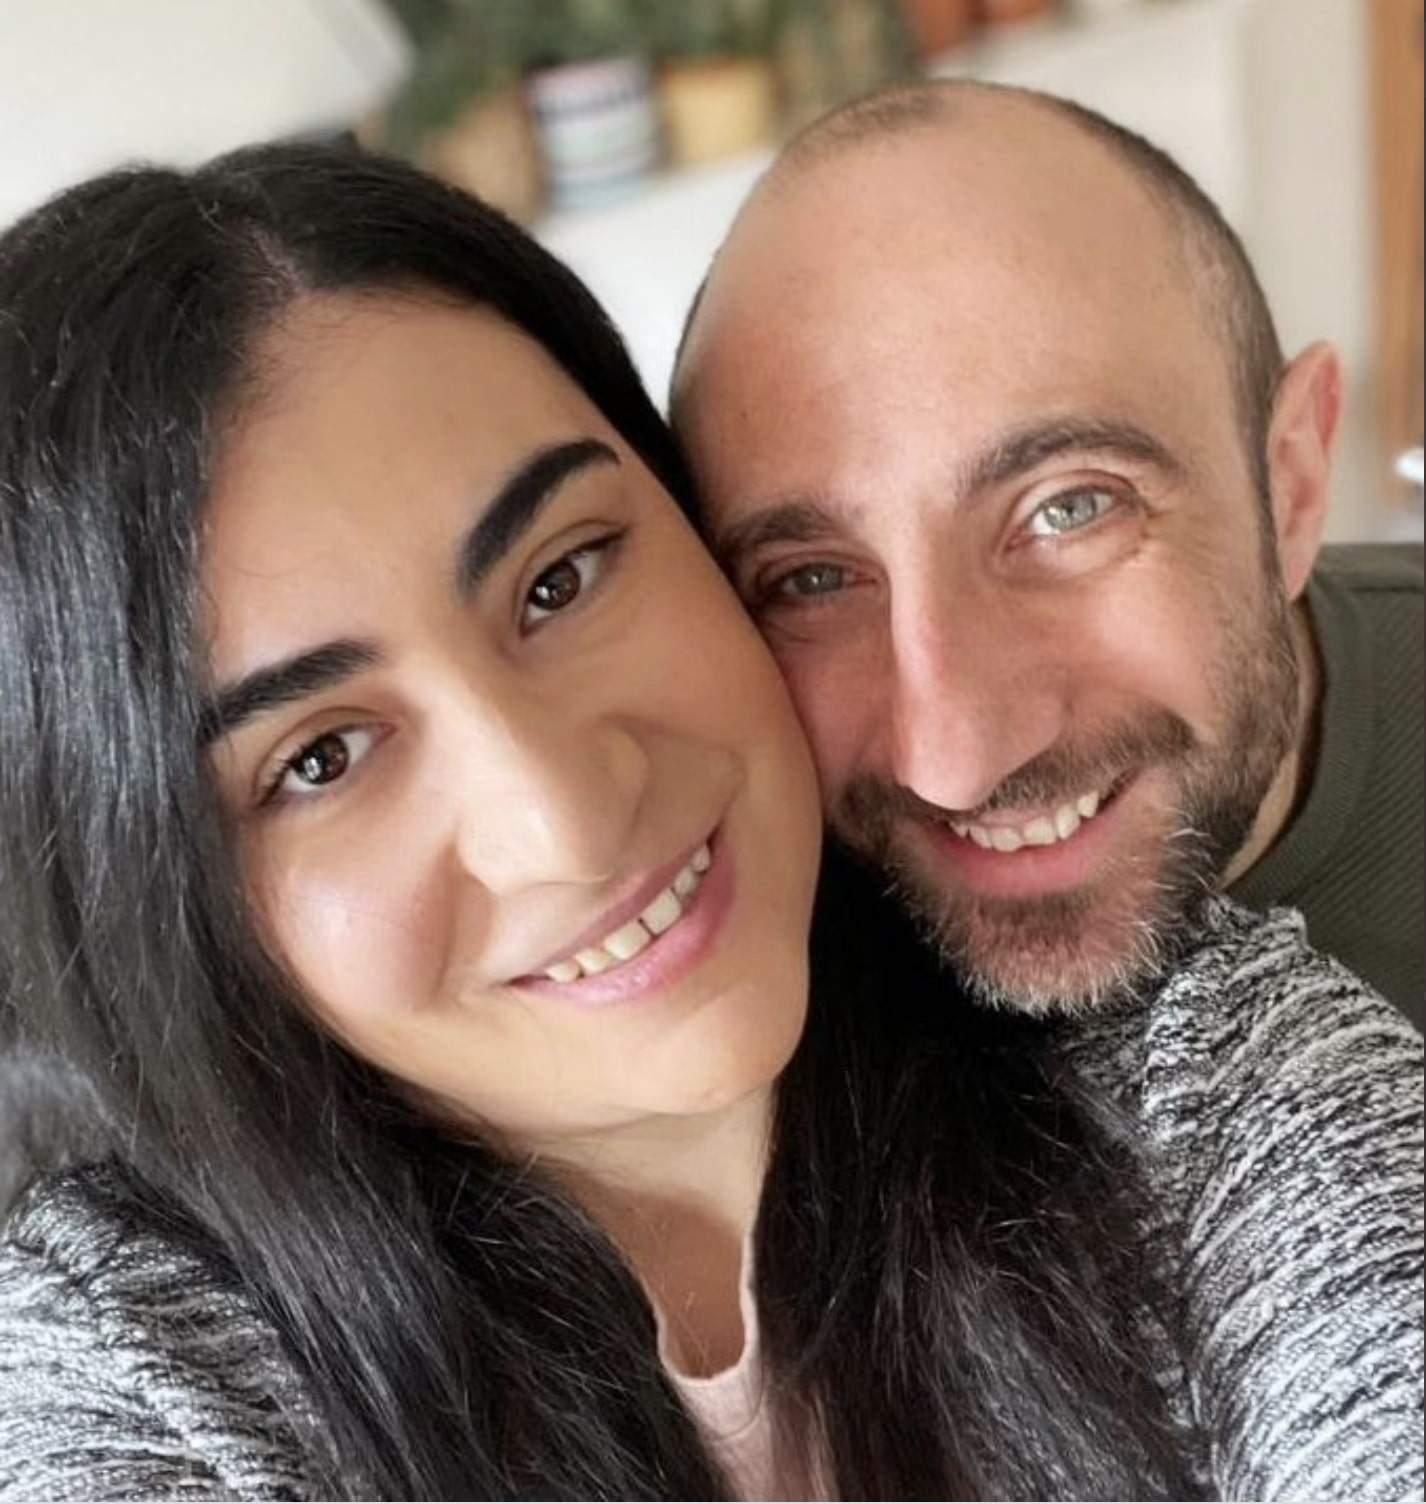 Nicoletta Peddis and her partner, Cristian Vinci